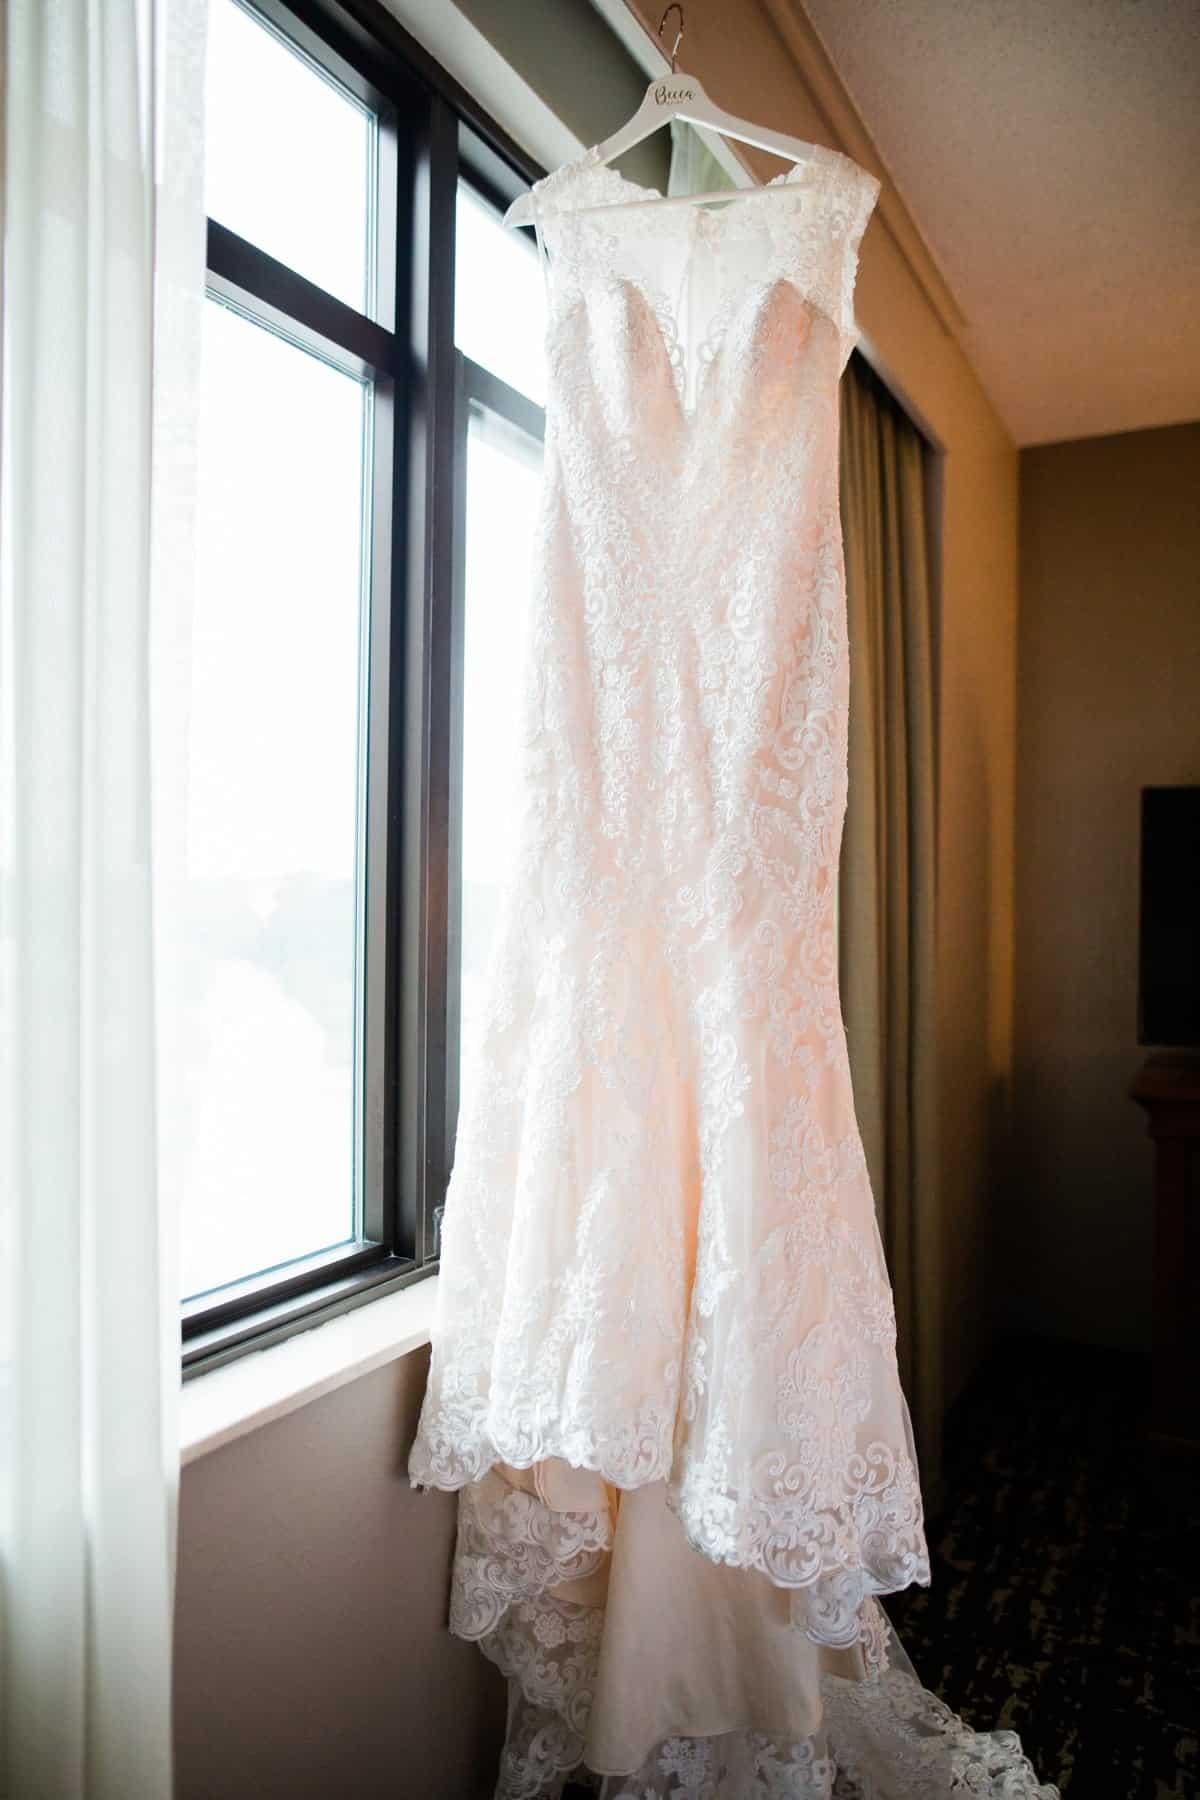 St. Louis Wedding Photographer, St. Charles Convention Center Wedding, Wedding Dress Detail